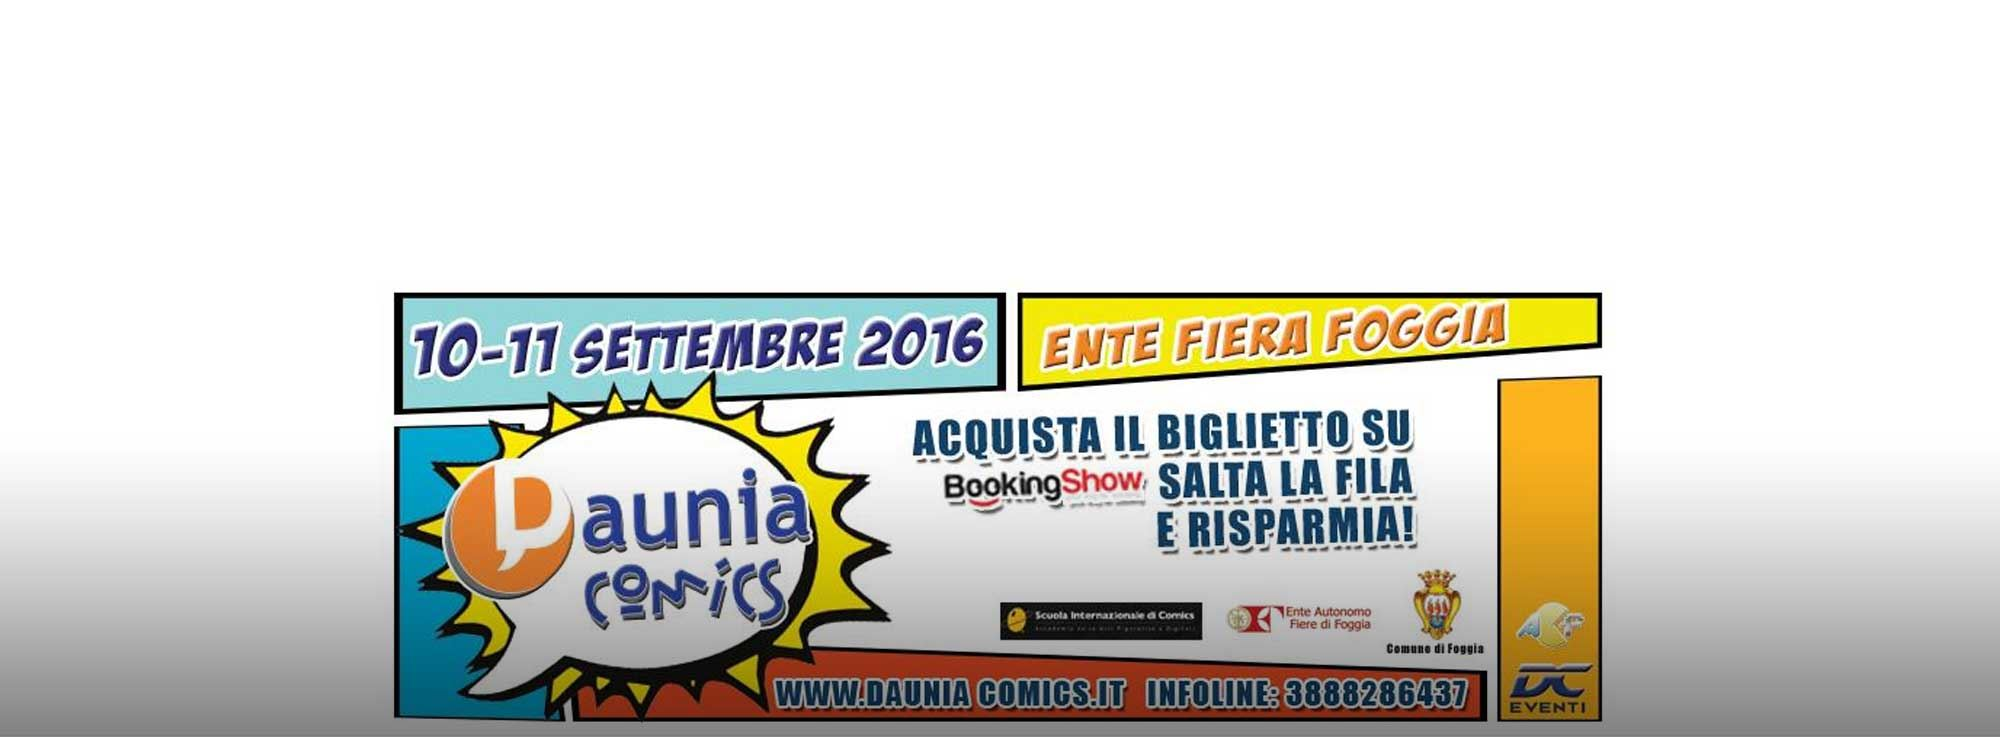 Foggia: Daunia Comics 2016